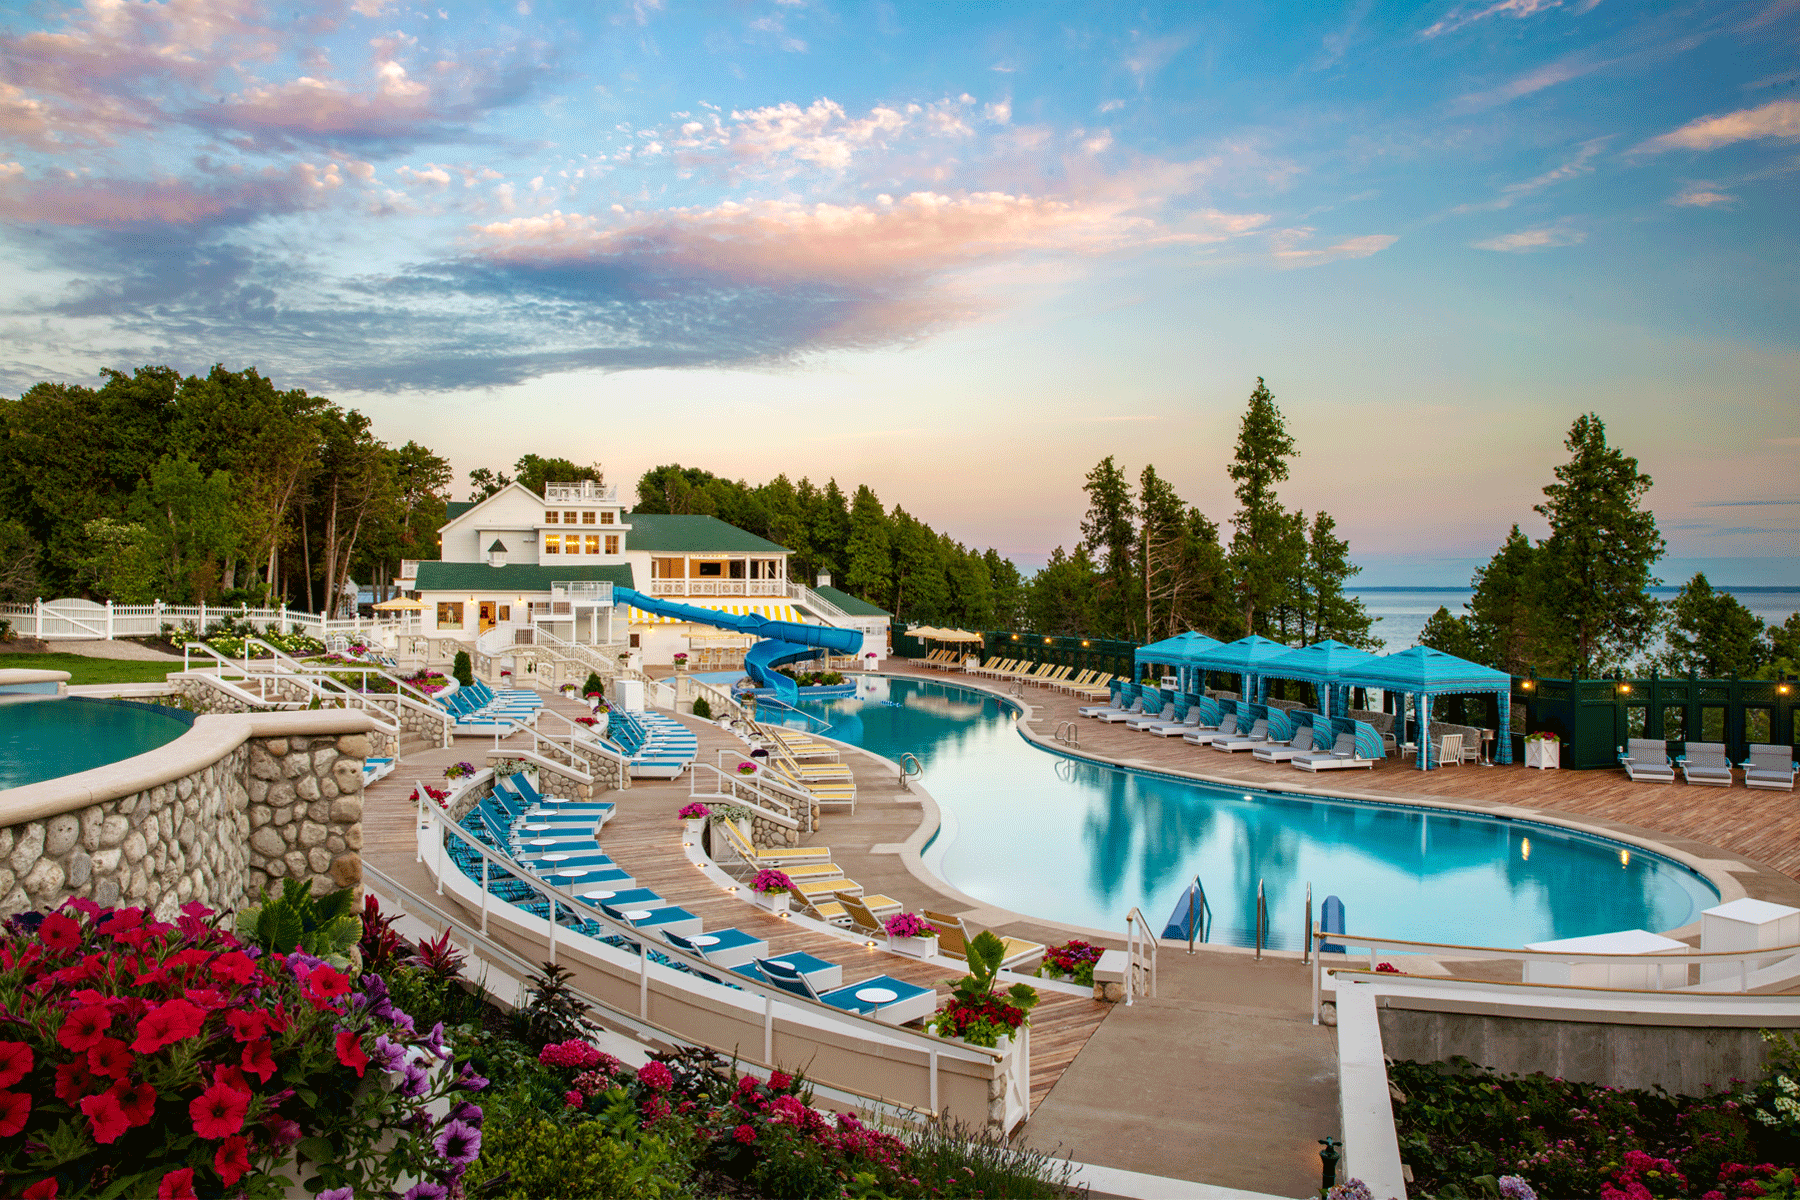 Grand-Hotel-mackincac-island-michigan-pool